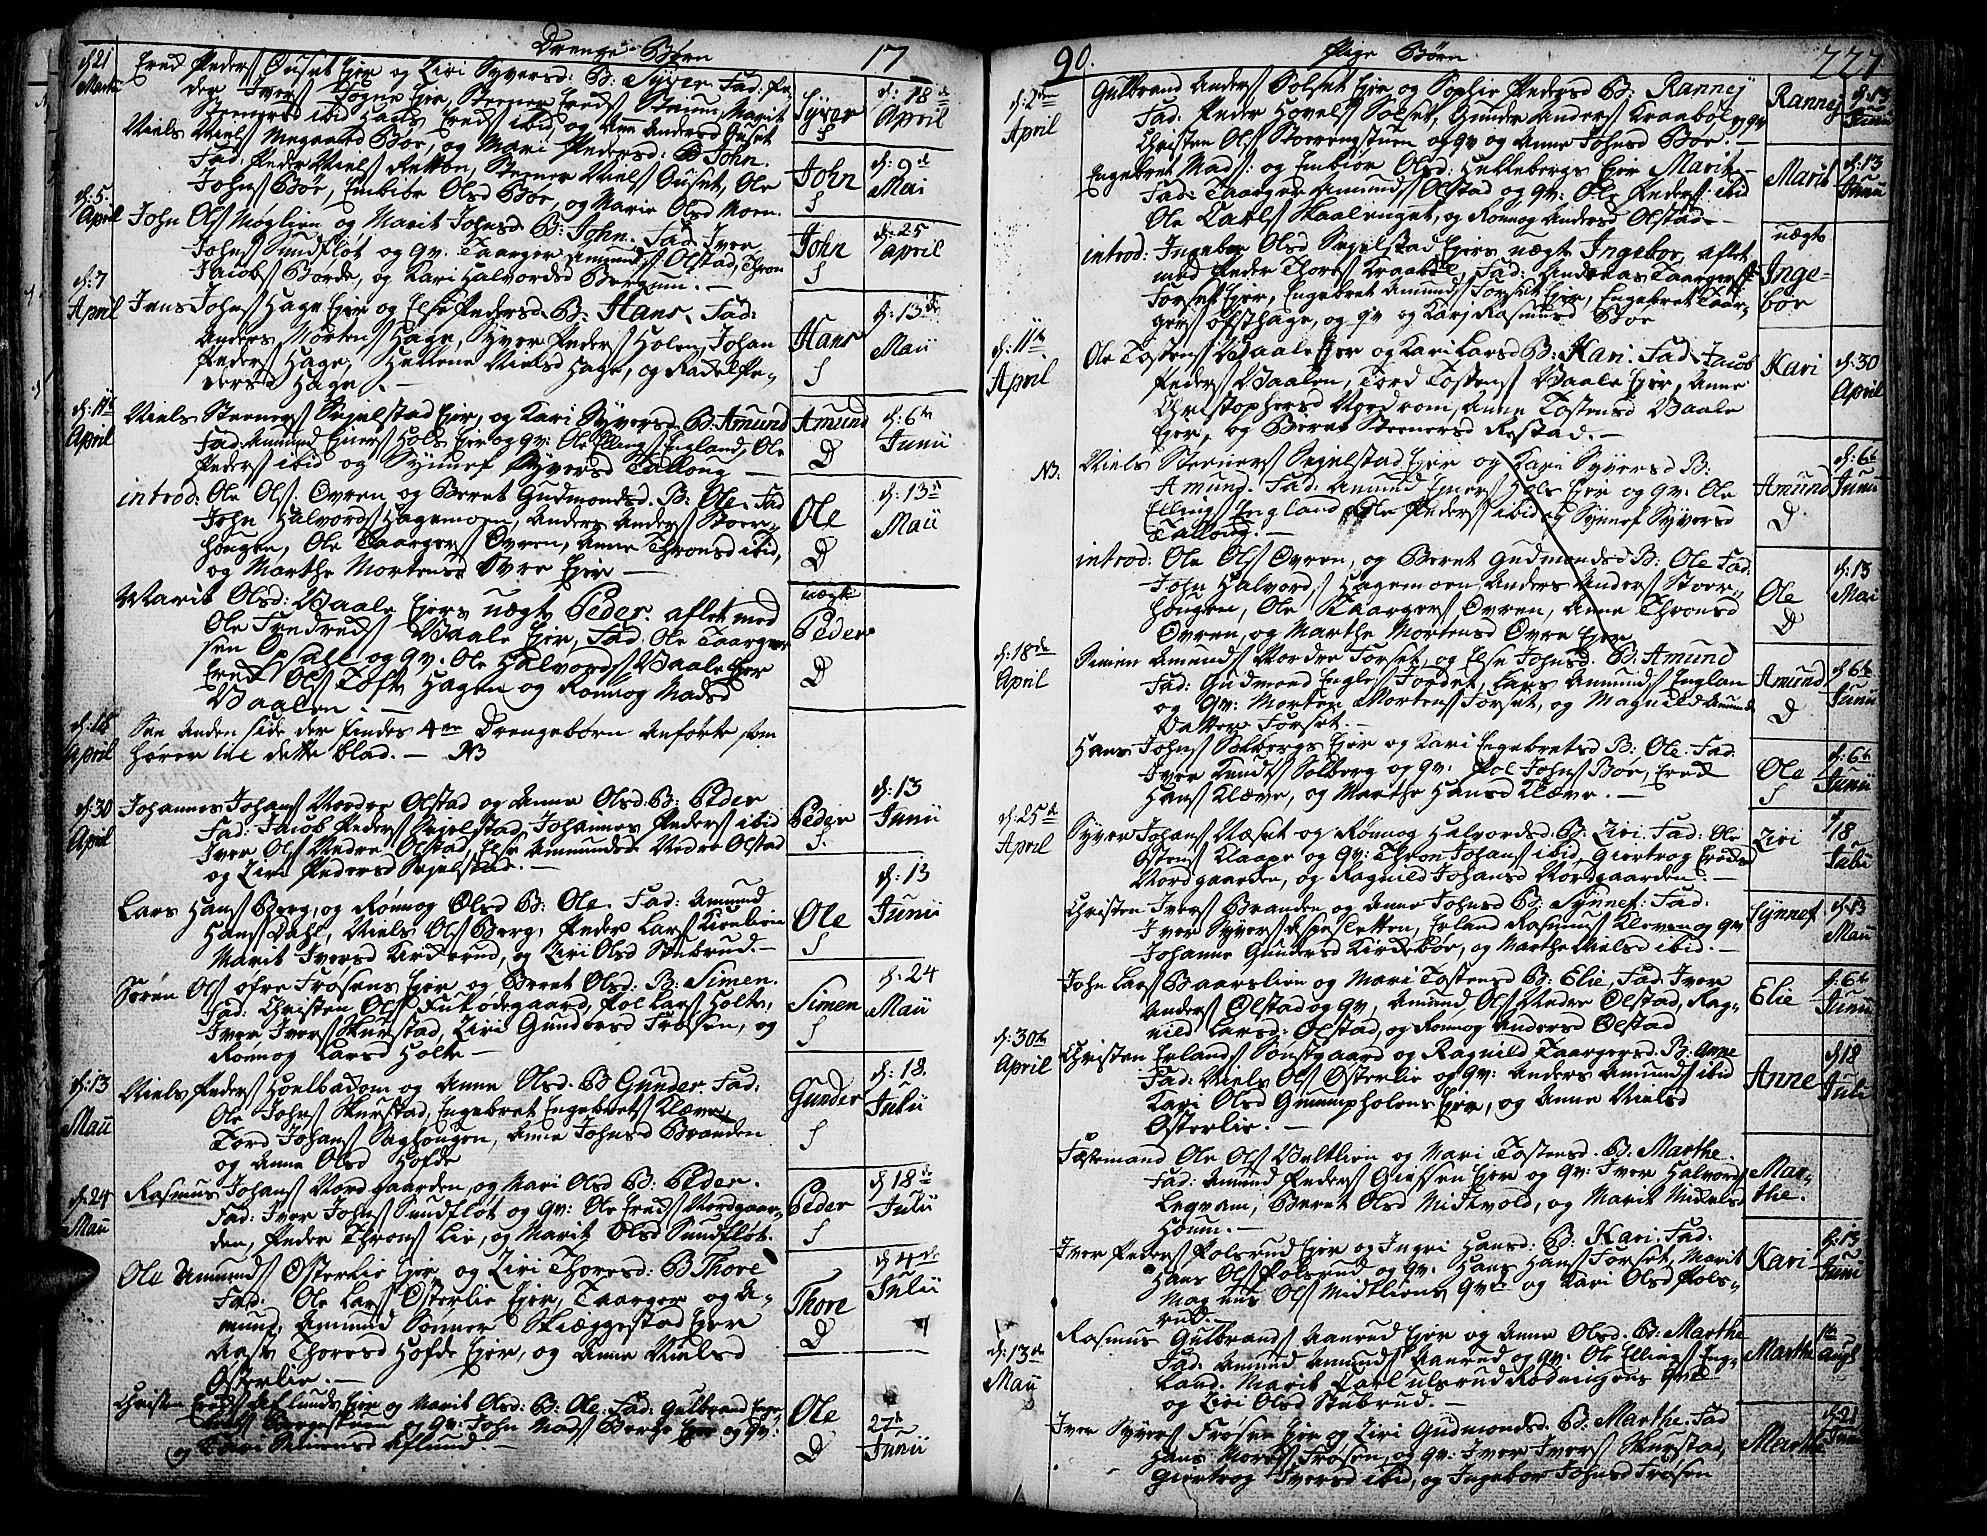 SAH, Gausdal prestekontor, Ministerialbok nr. 3, 1758-1809, s. 227